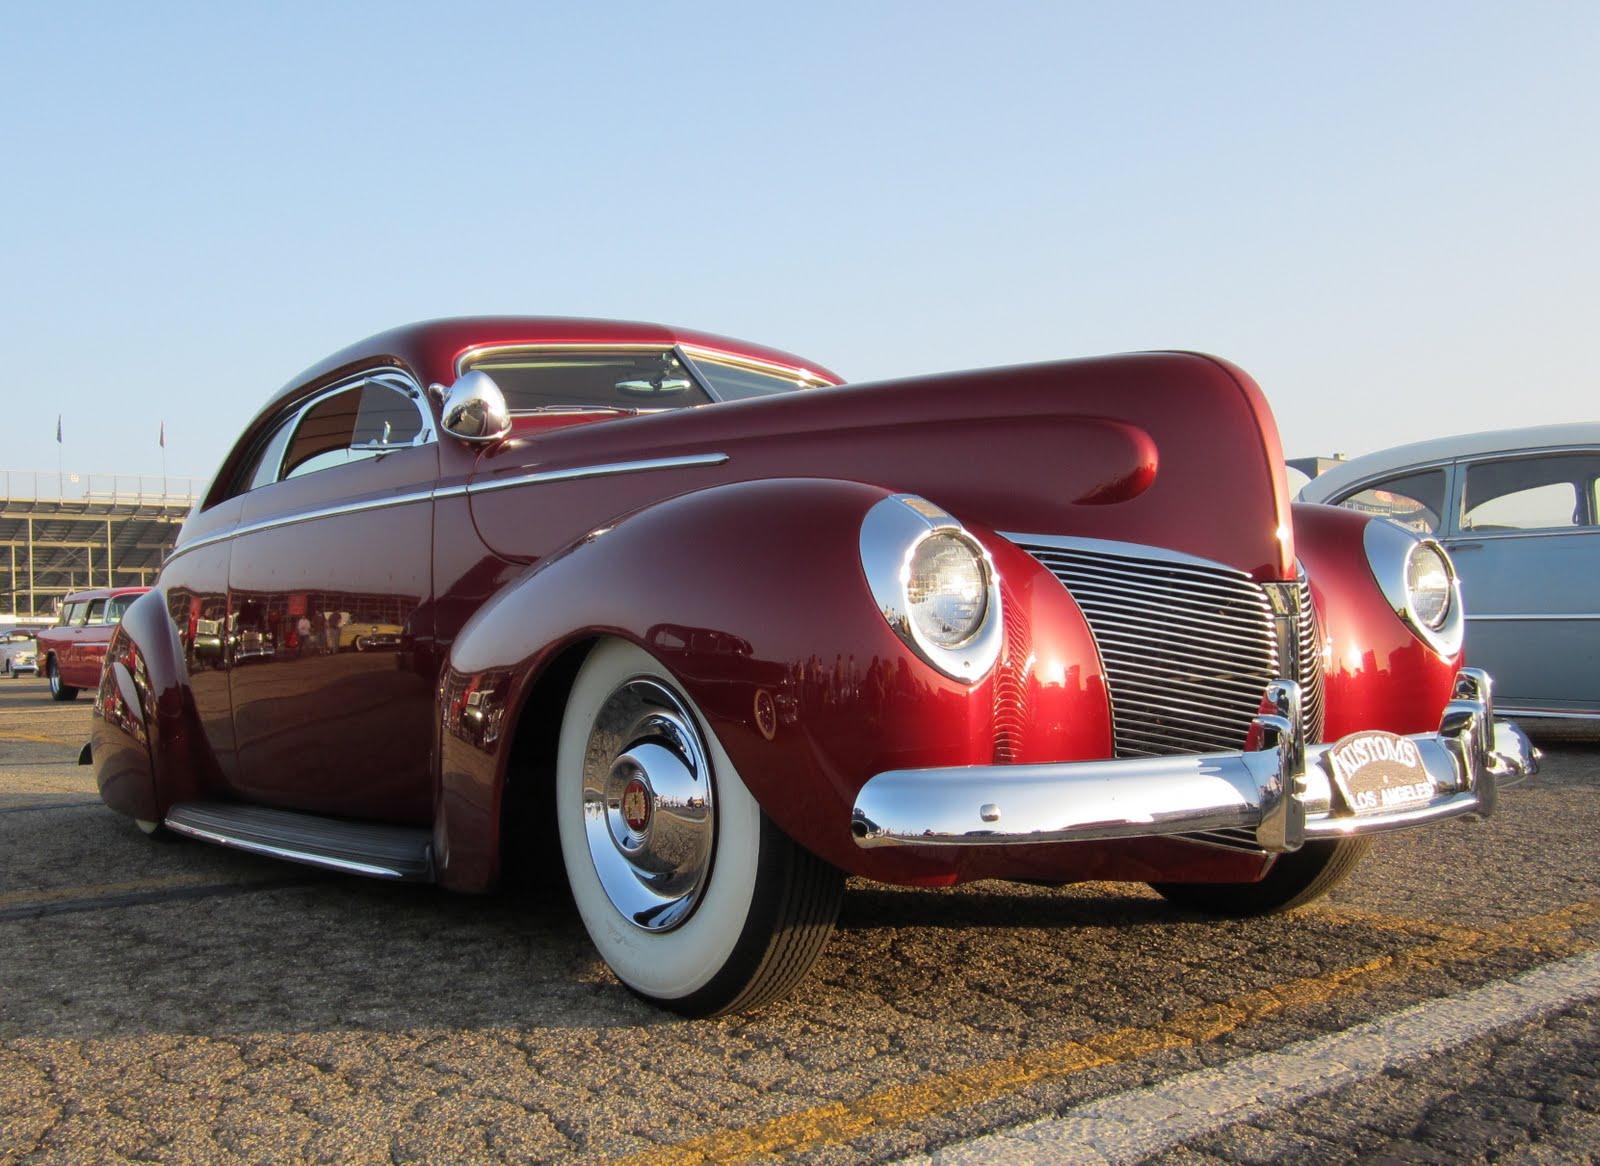 Covering Classic Cars : Pomona Swap Meet 8/14